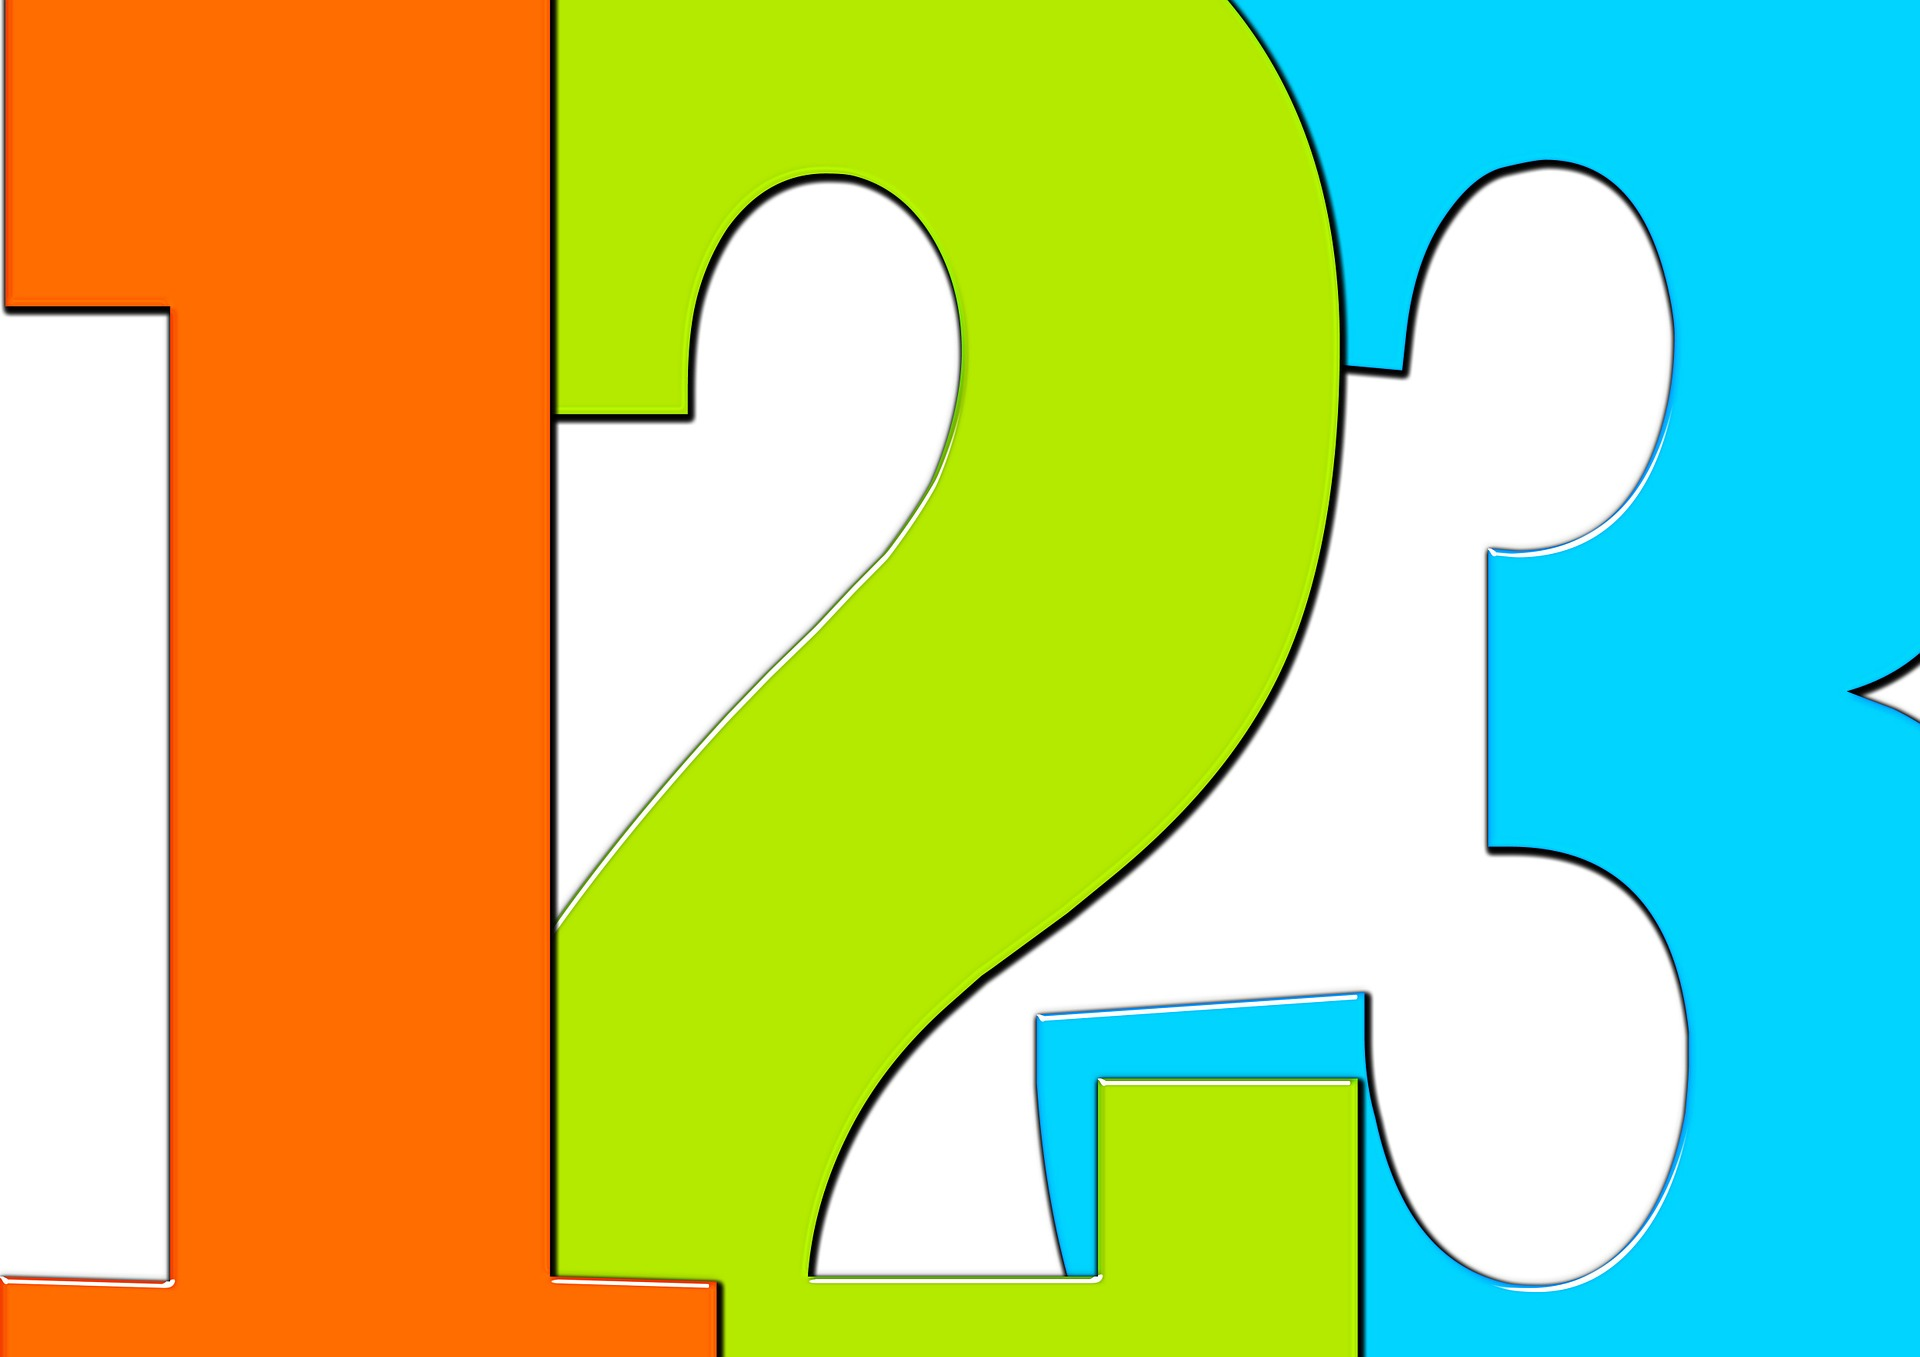 123, Símbolo, 南米, ペルー, ラテン, ダンス, パーティー, 音楽, 歌詞